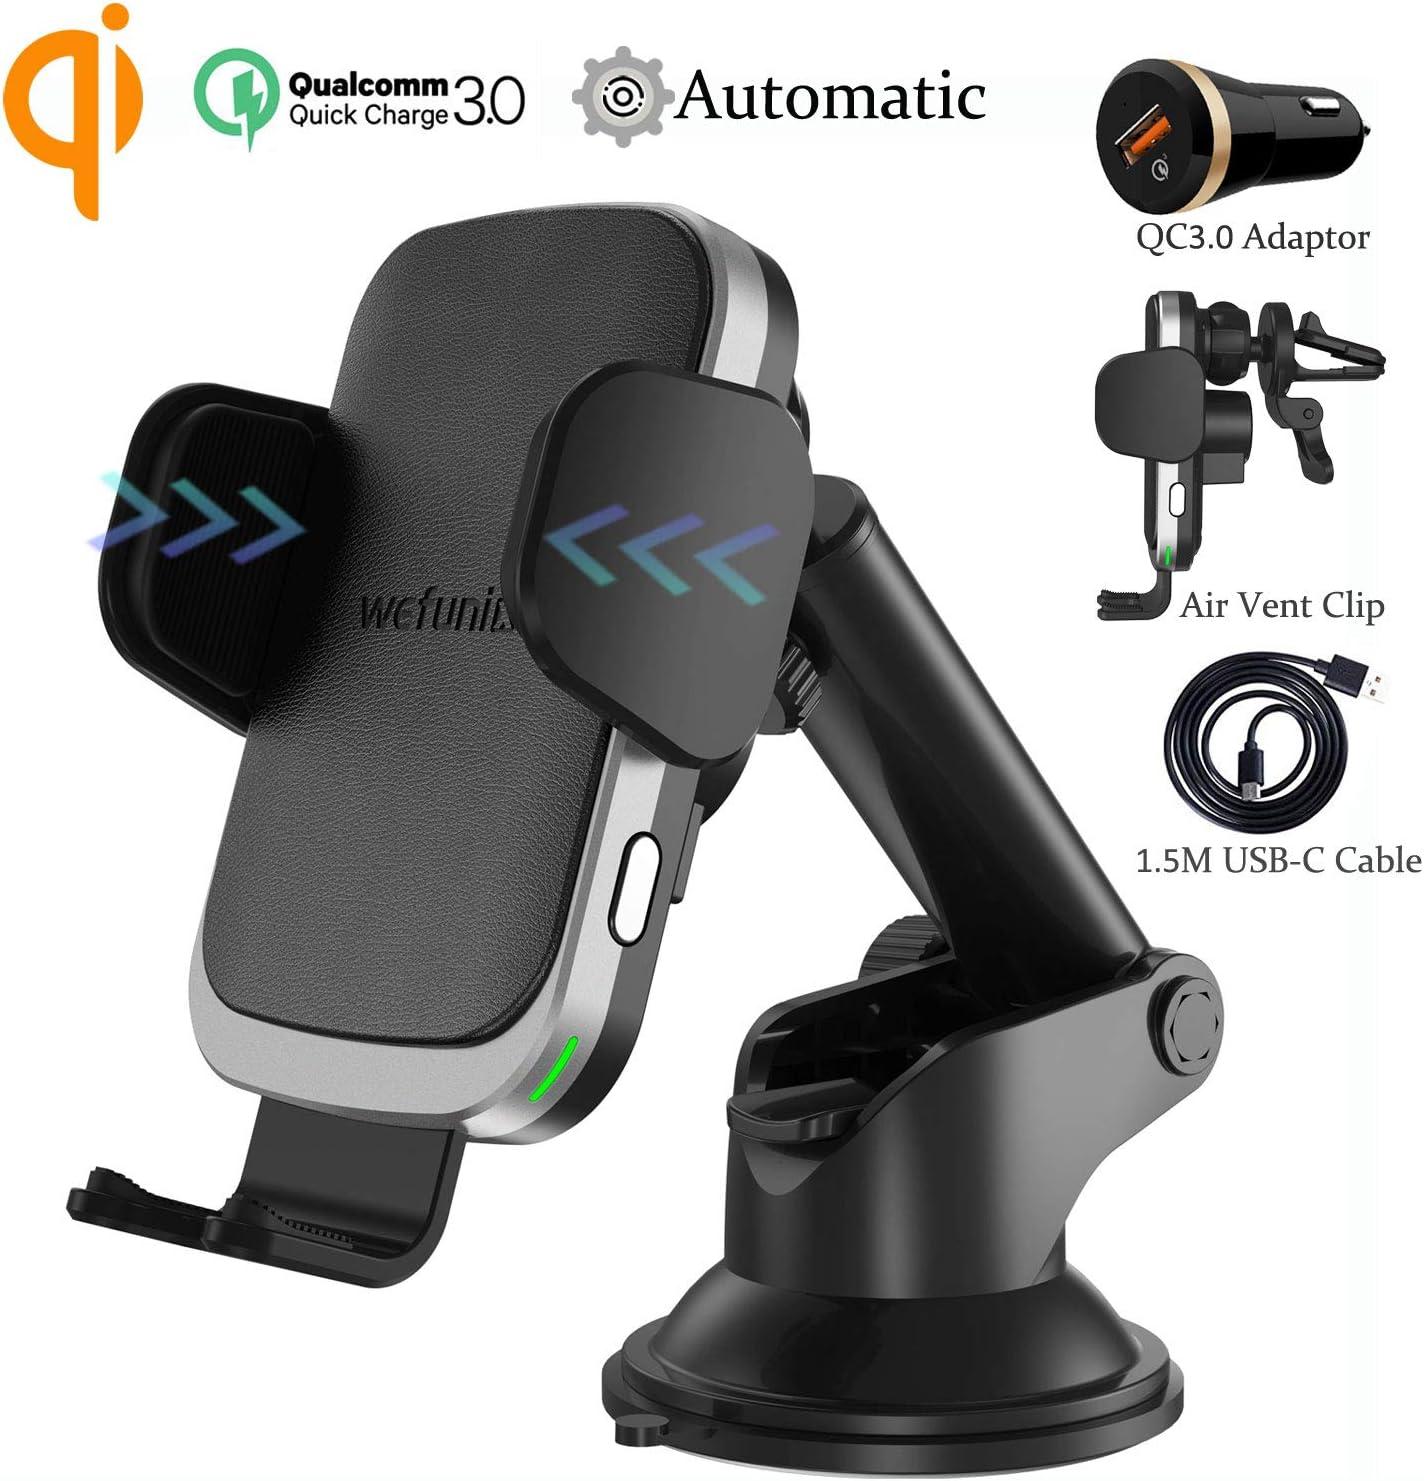 Wefunix Cargador Inalámbrico Coche Carga Rápida Sensor Automatico USB C+Adaptador QC 3.0, 7.5W para iPhone 11 Pro XS Max XR X 8 Plus, 10W para Samsung Galaxy S10 S9 S8 S7 Note 10/9/8/5, Huawei P30 Pro